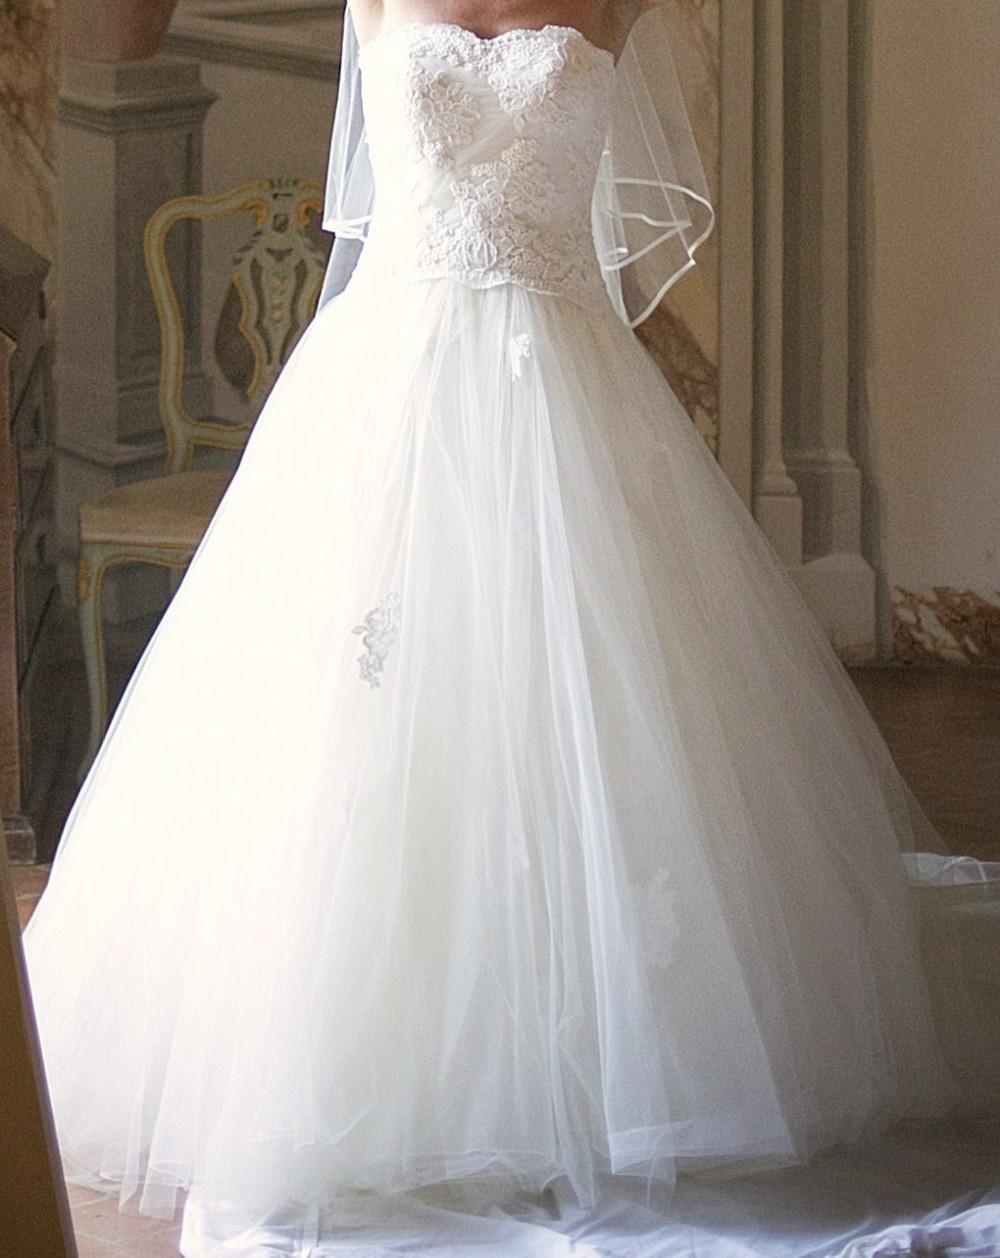 Lusan mandongus sassi second hand wedding dress on sale 57 for Second hand wedding dresses san diego